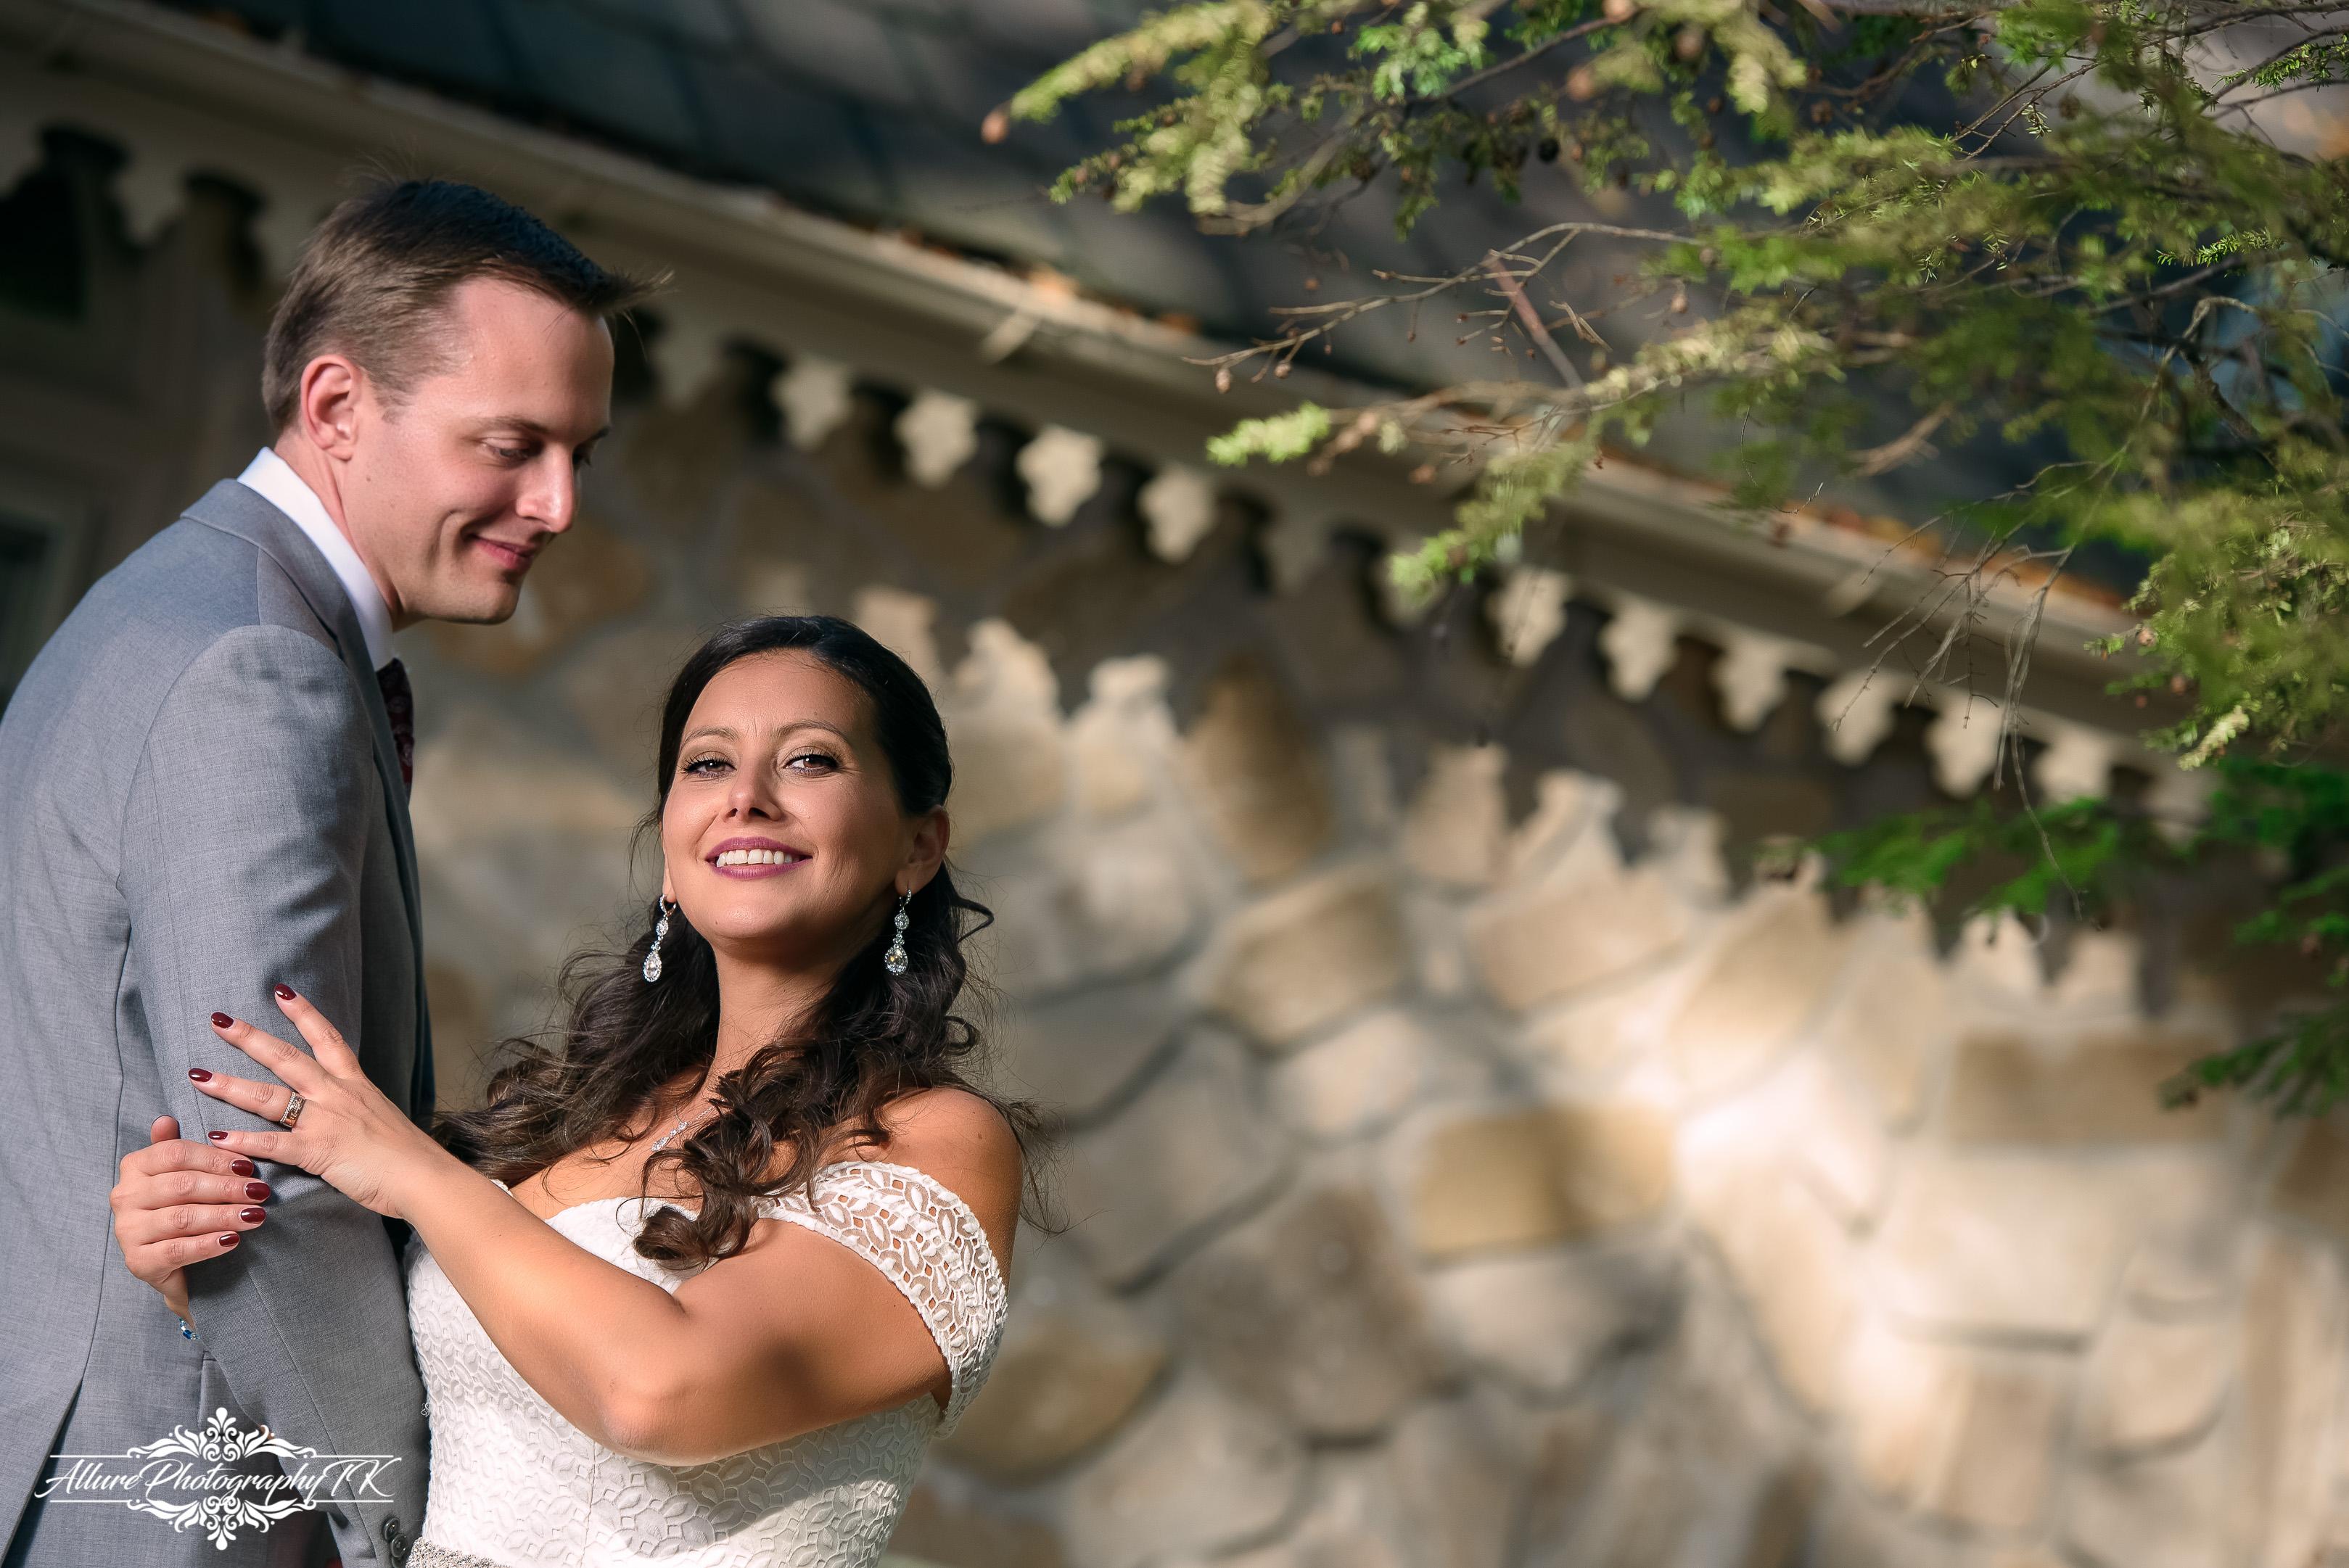 Cleveland Metropark wedding